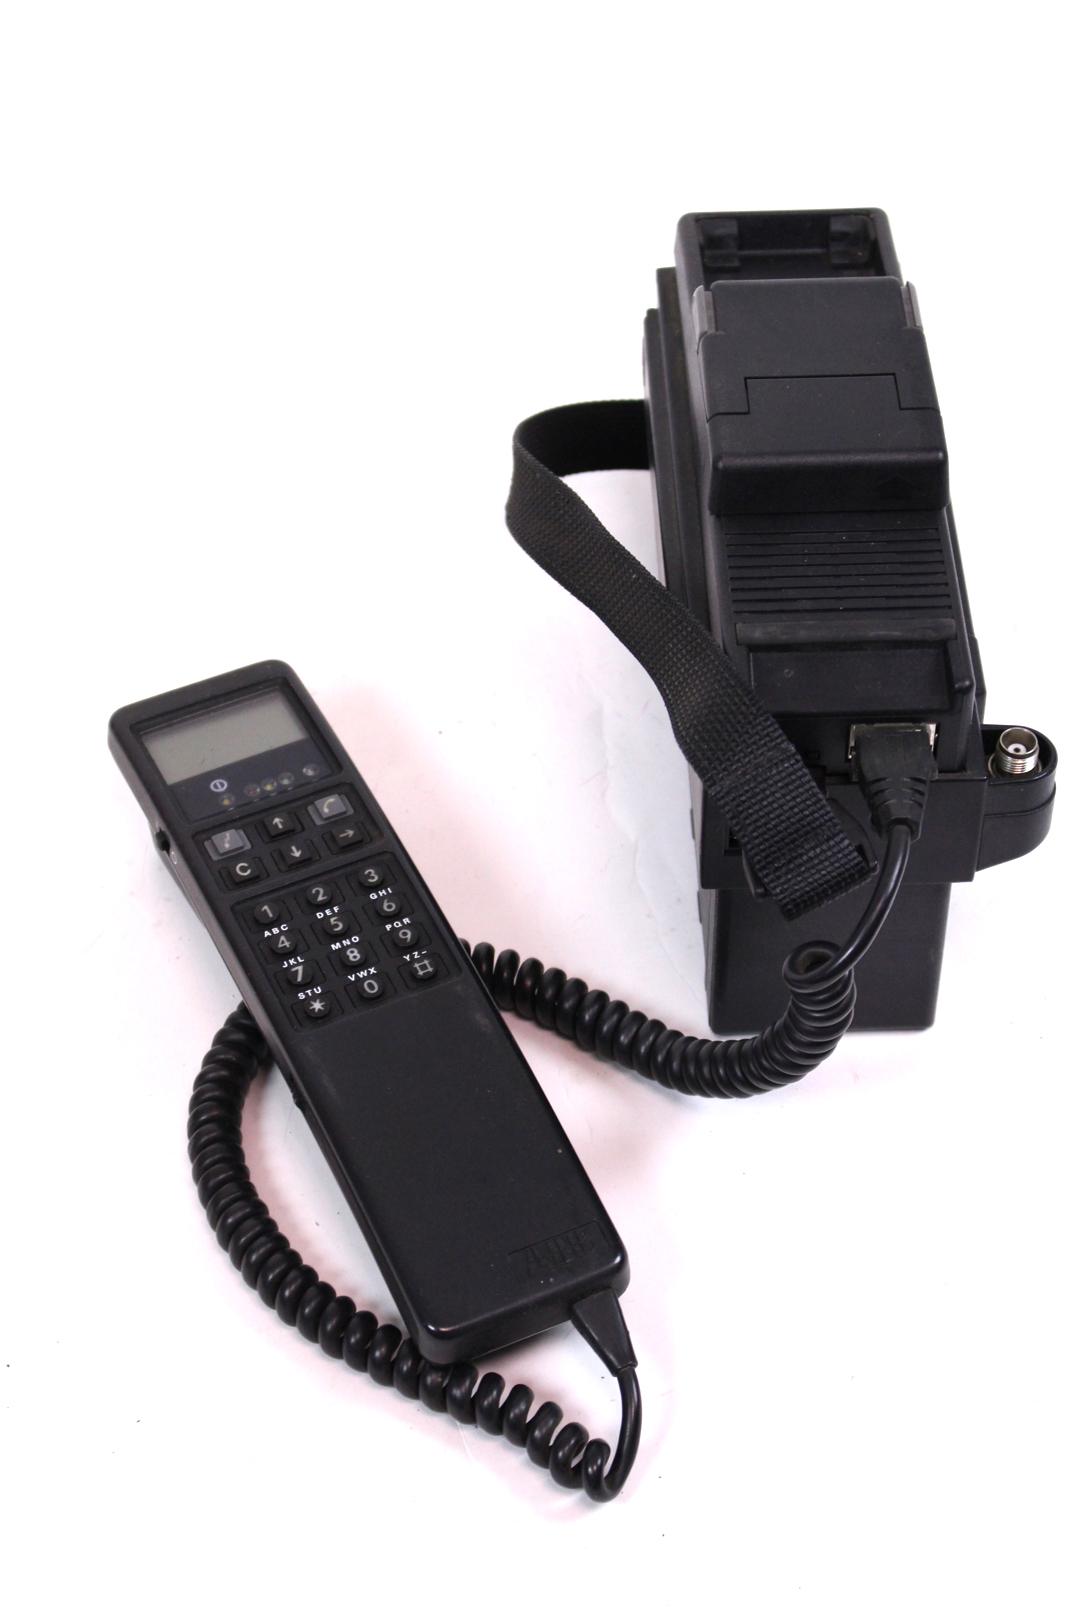 abb c45 bg 3 mobiltelefon autotelefon kfz mobil telefon retro handy mobile phone ebay. Black Bedroom Furniture Sets. Home Design Ideas